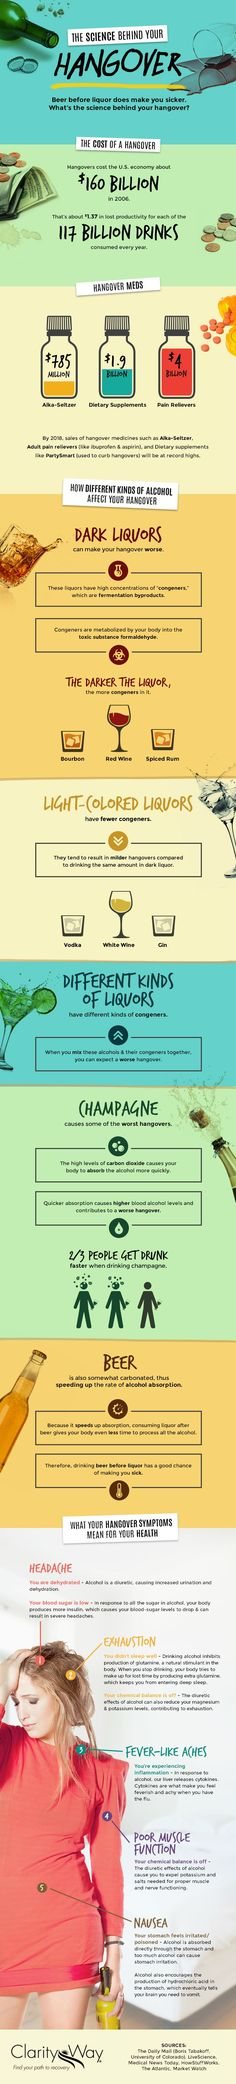 The Science Of Hangovers | IFLScience